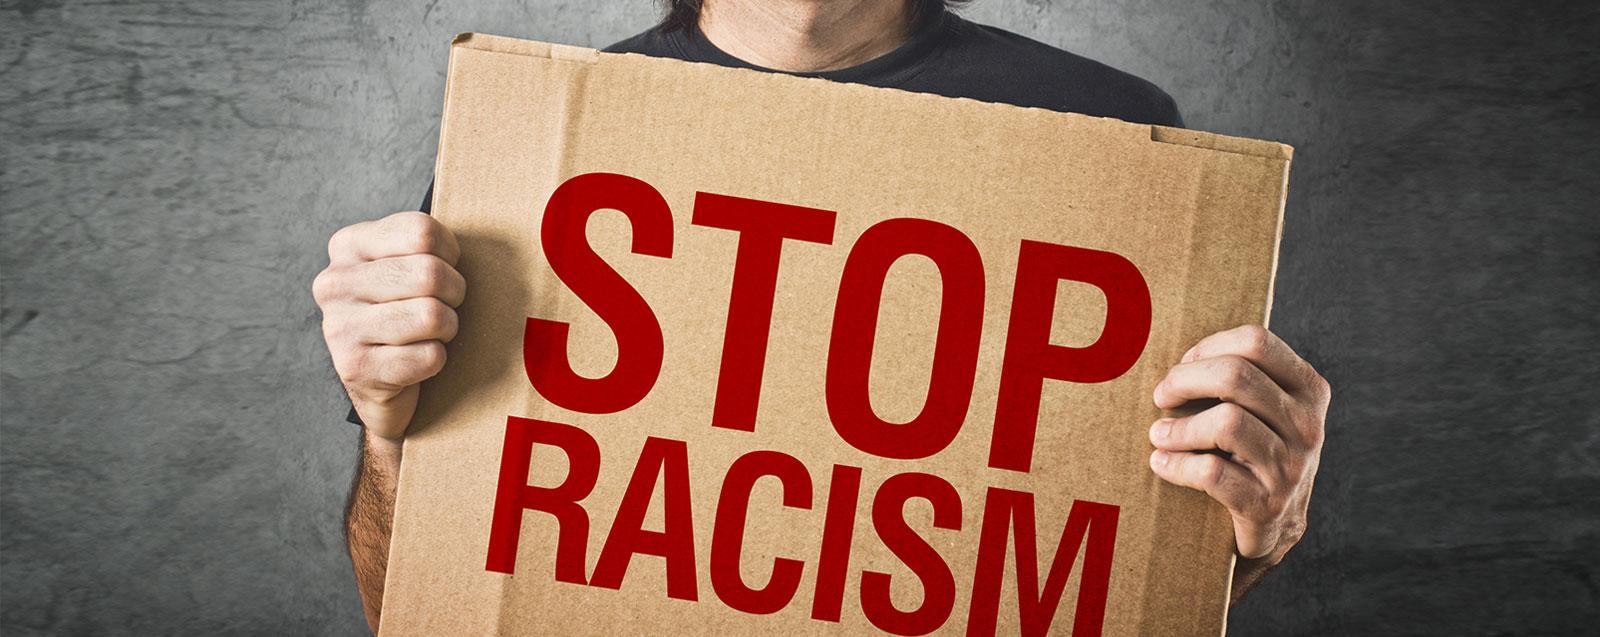 https://i1.wp.com/www.australiansagainstracism.org/wp-content/uploads/2013/02/stop-racism-please.jpg